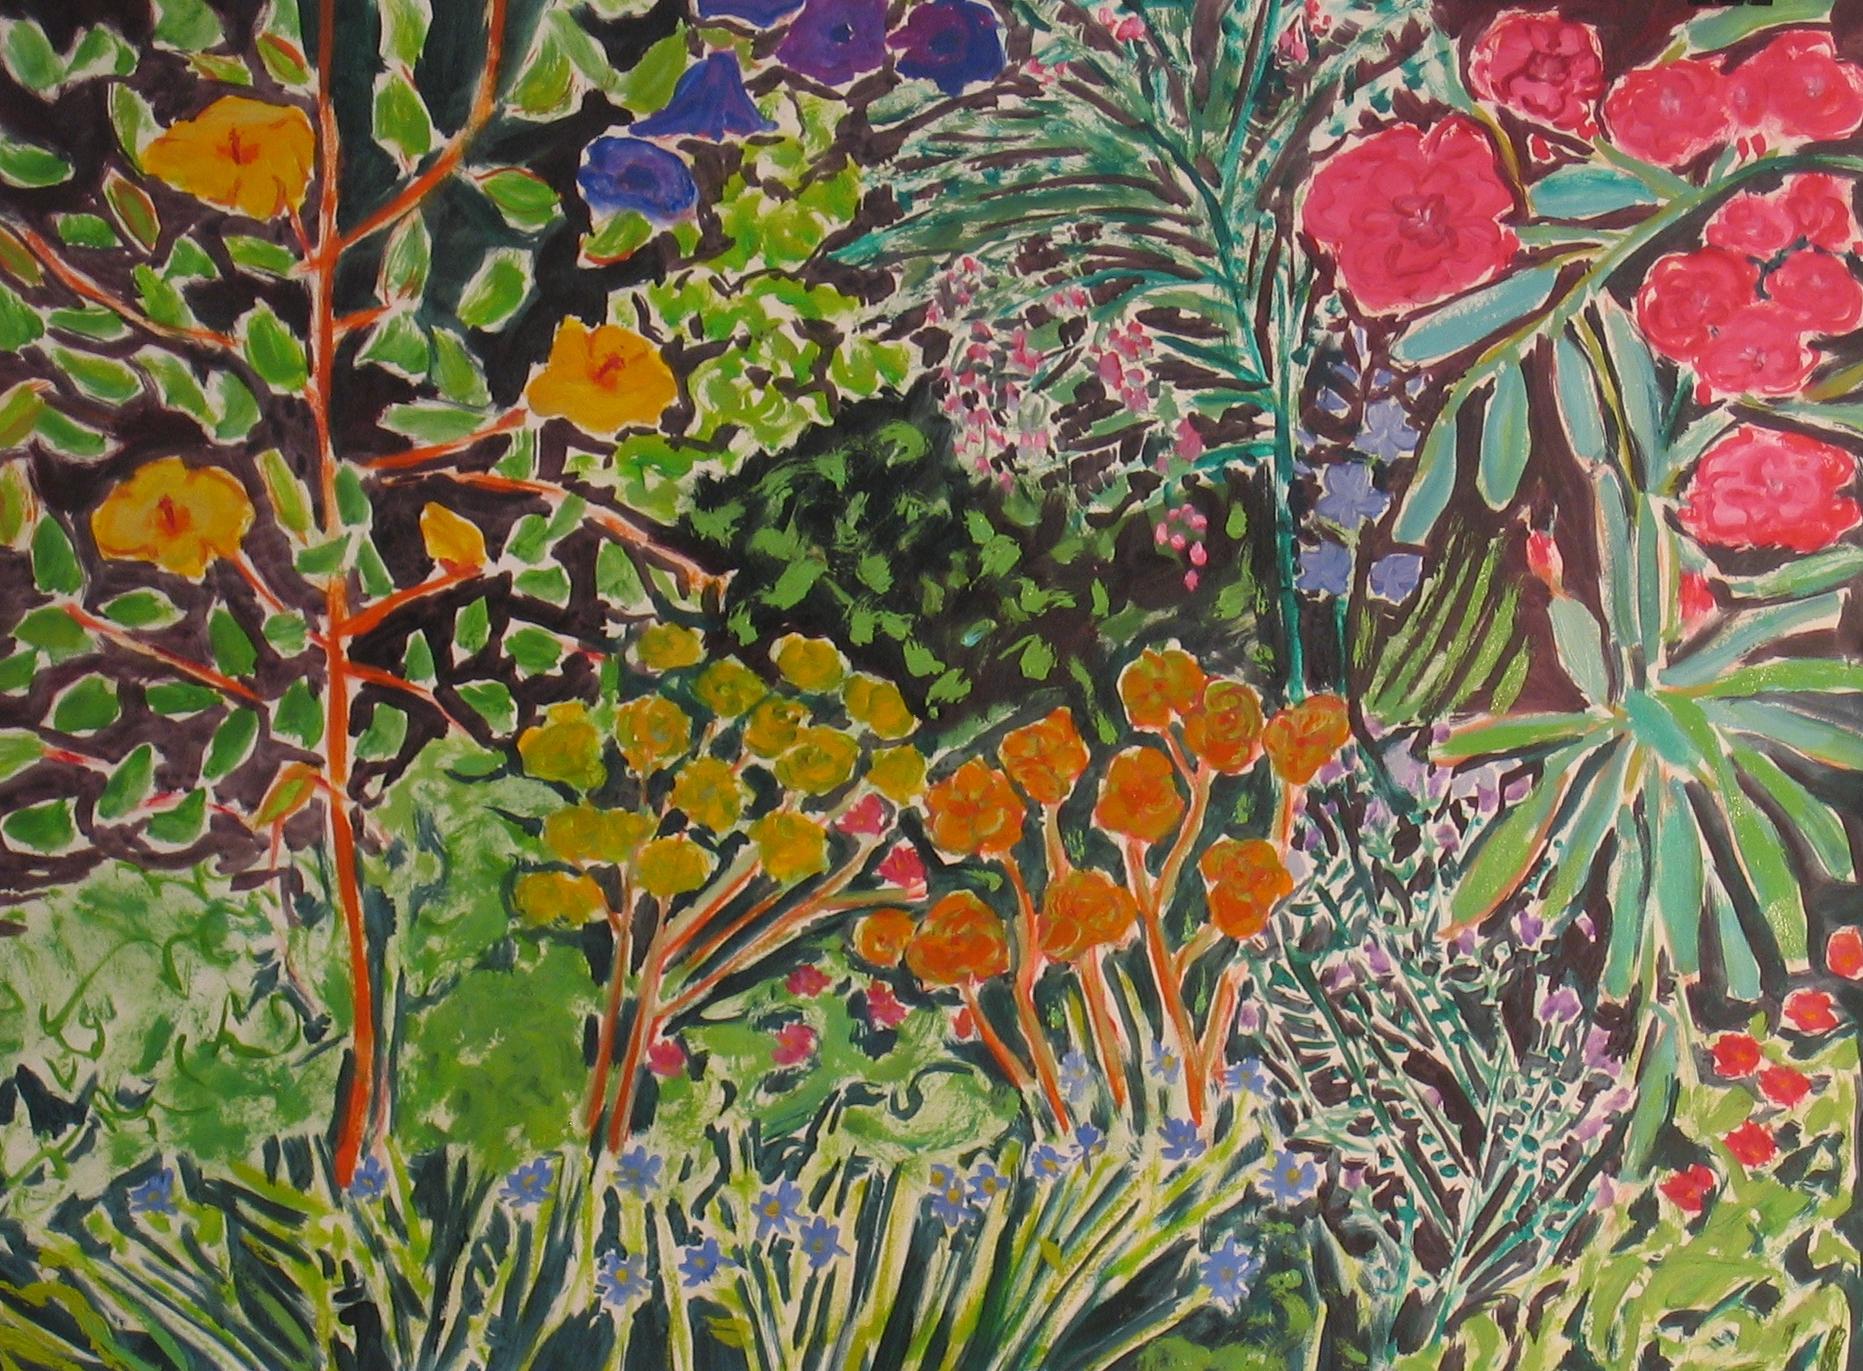 L Mojacar Garden (22x30)ins oil on paper.jpg